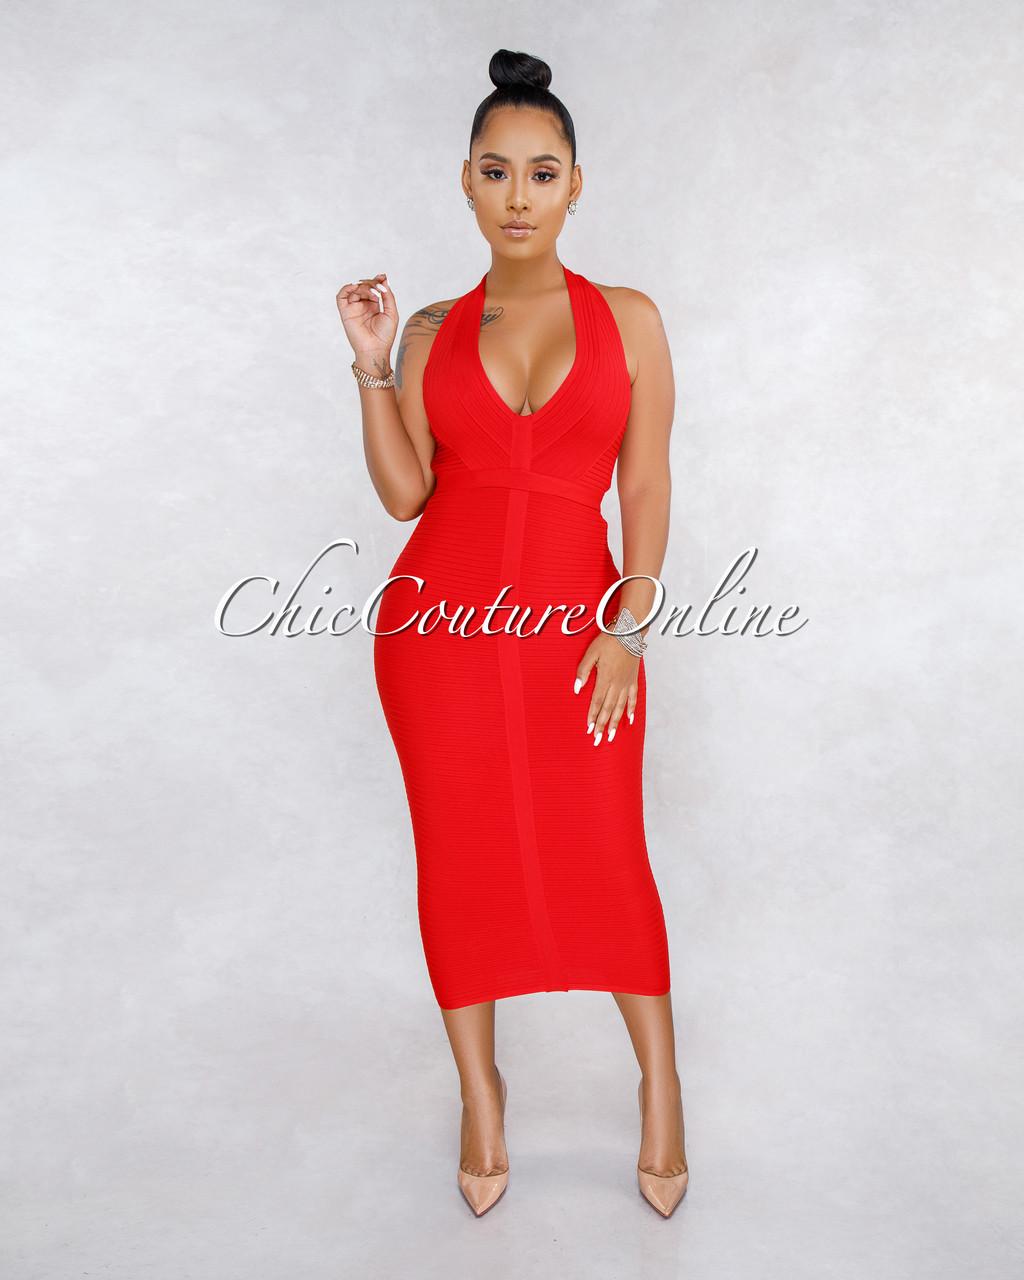 08763ca7d5e1 Lulia Red Ribbed Halter Midi Dress. Price   75.00. Image 1